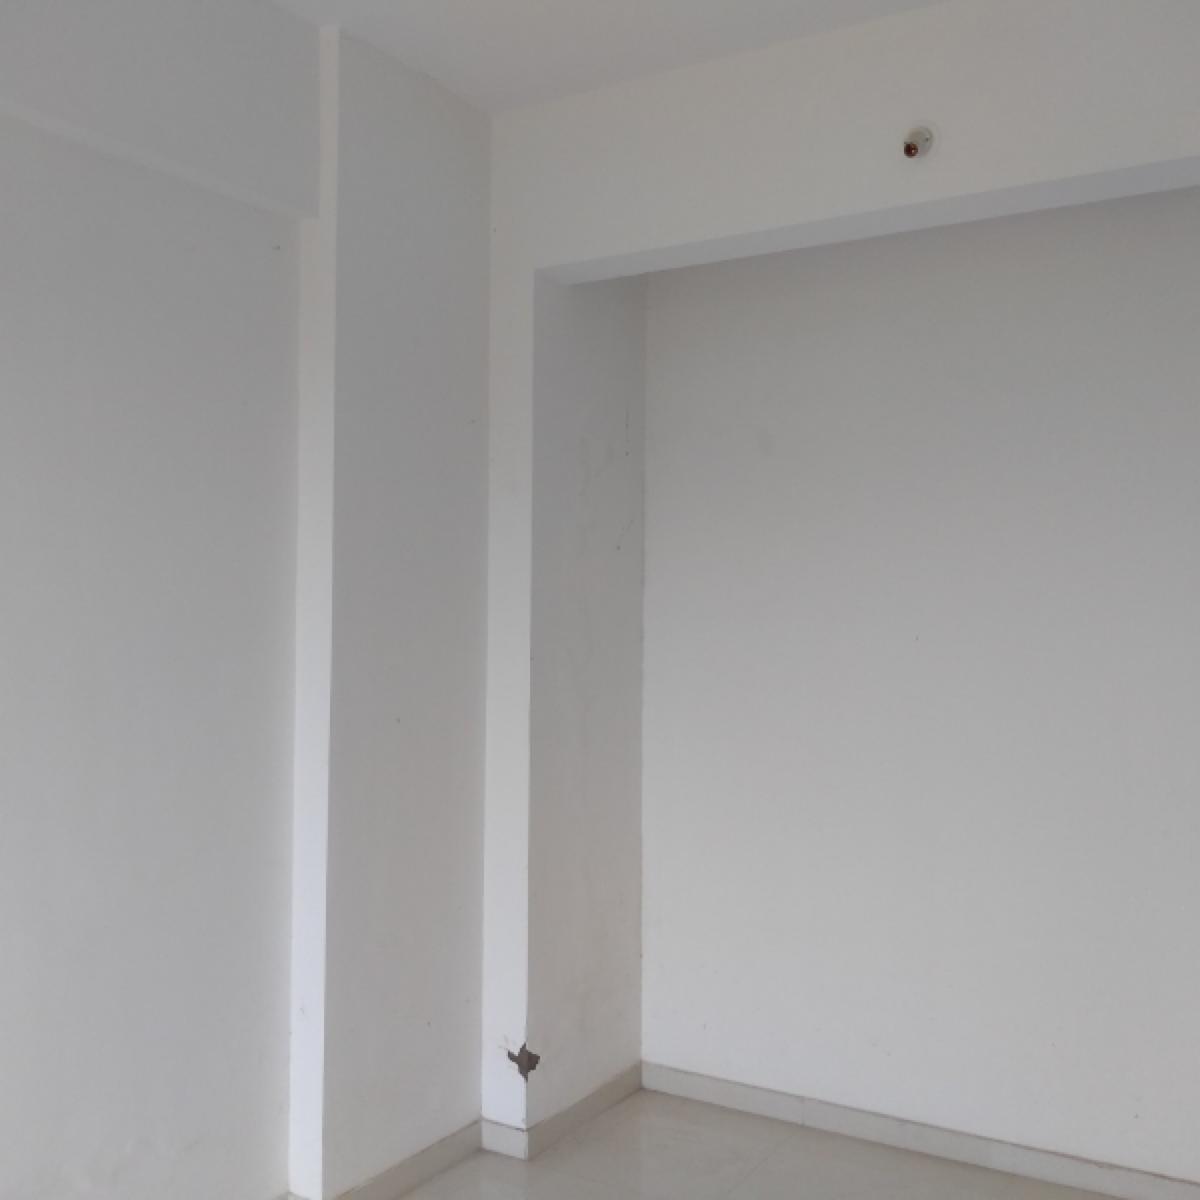 2 BHK 632 Sq.Ft. Apartment in Ghodbunder Road